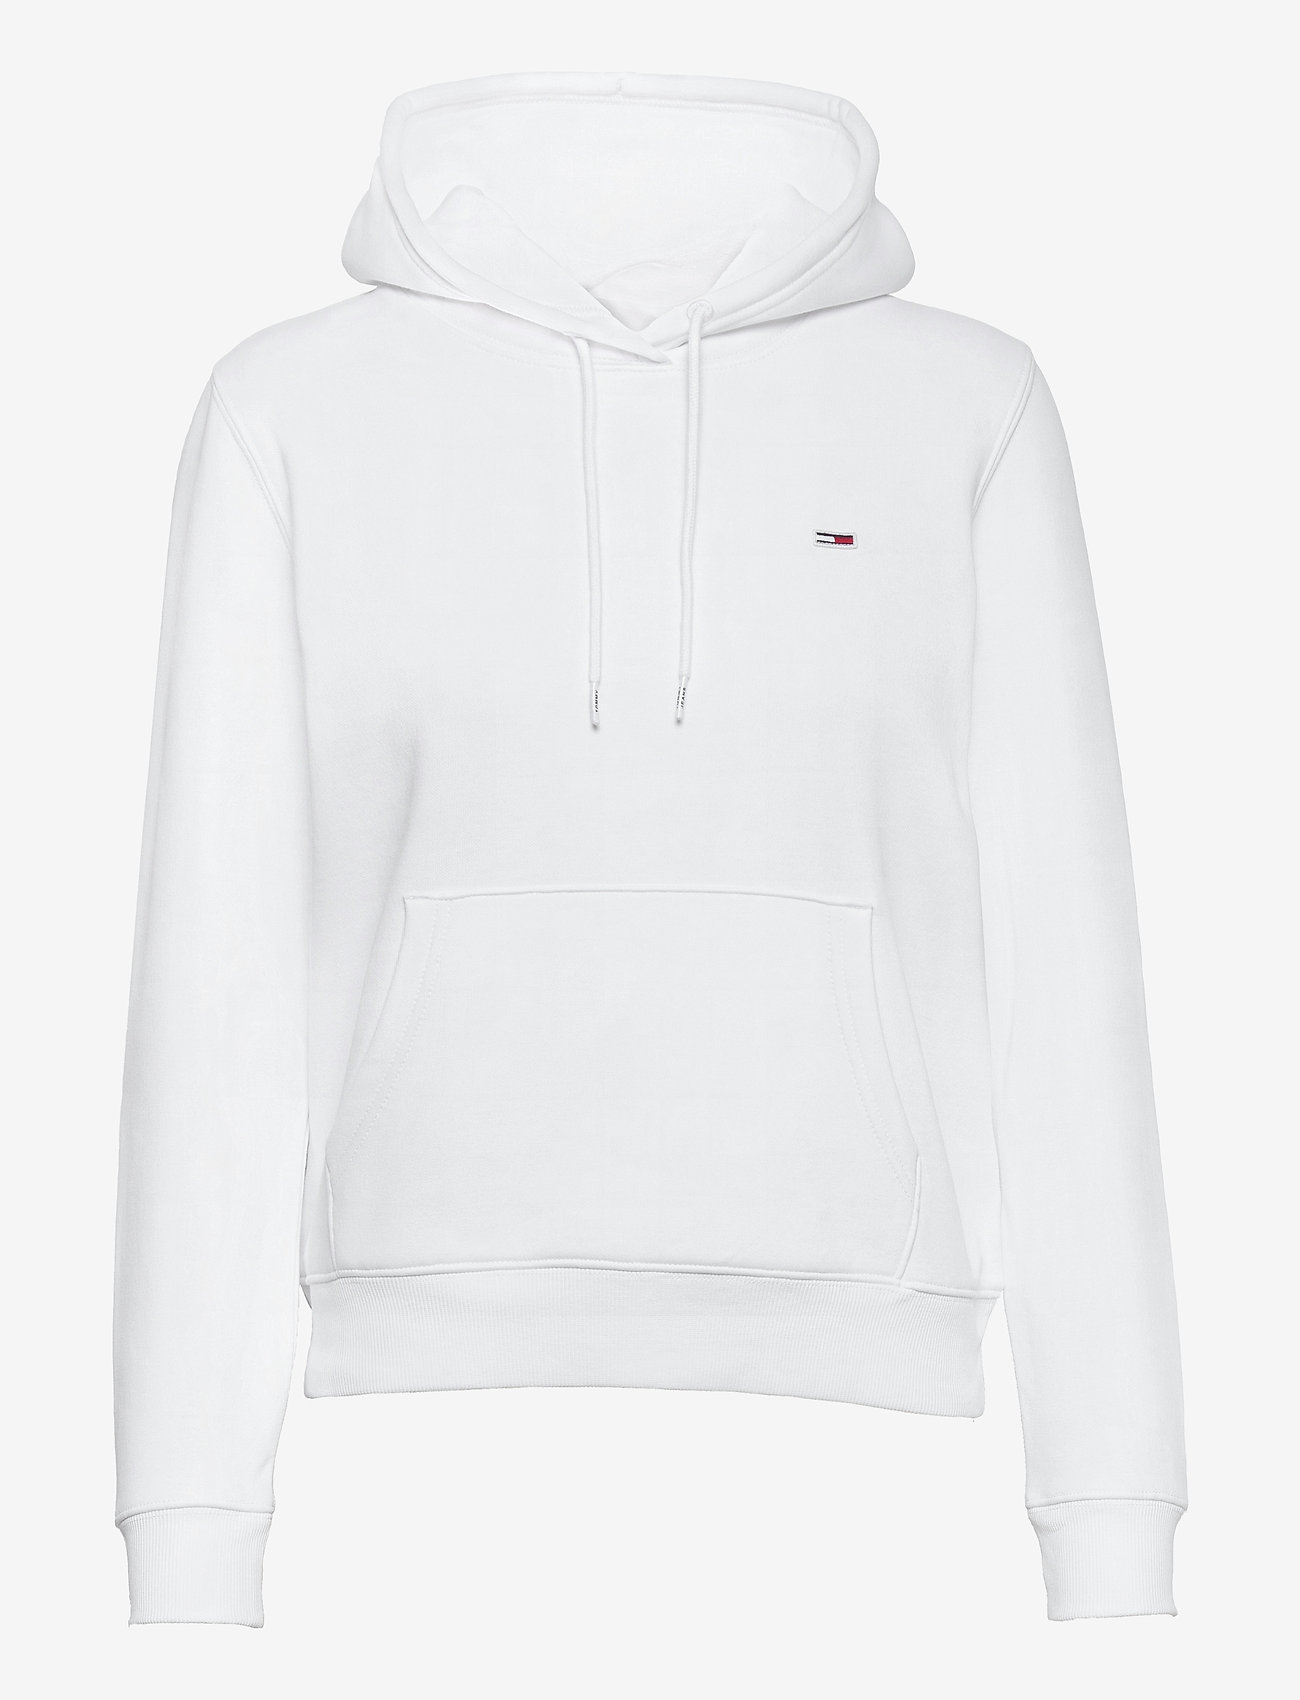 Tommy Jeans - TJW REGULAR FLEECE HOODIE - sweatshirts & hoodies - white - 0